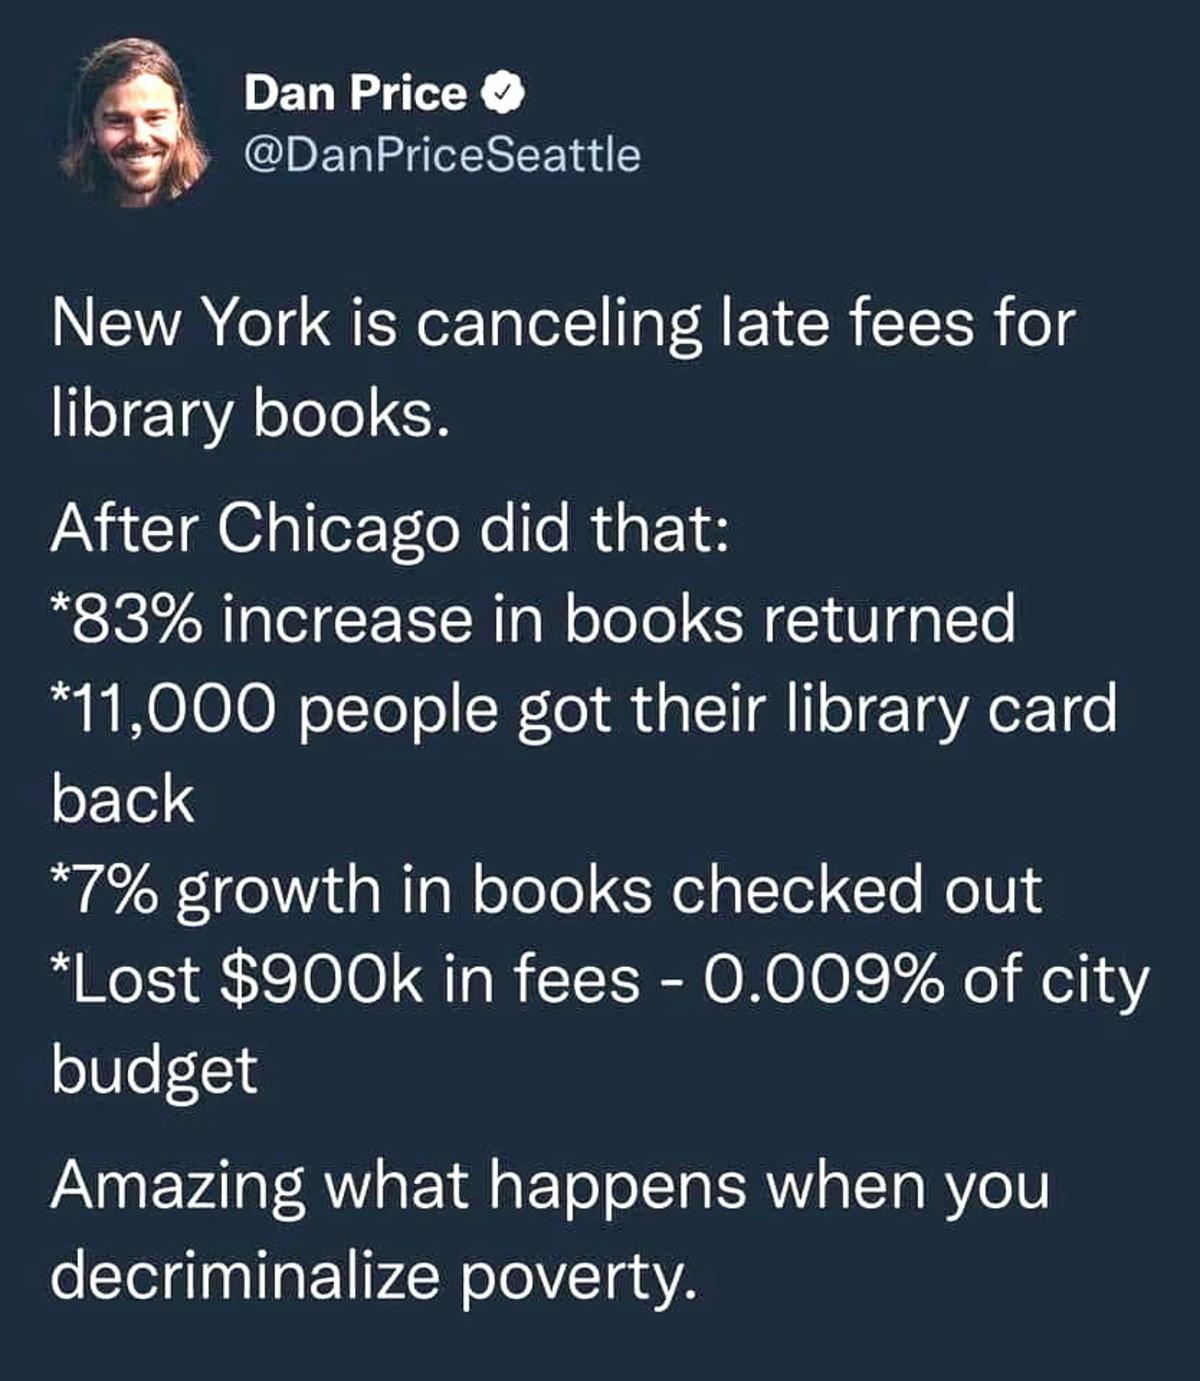 purgatory Red deer. .. Poverty? Just return the books, damn